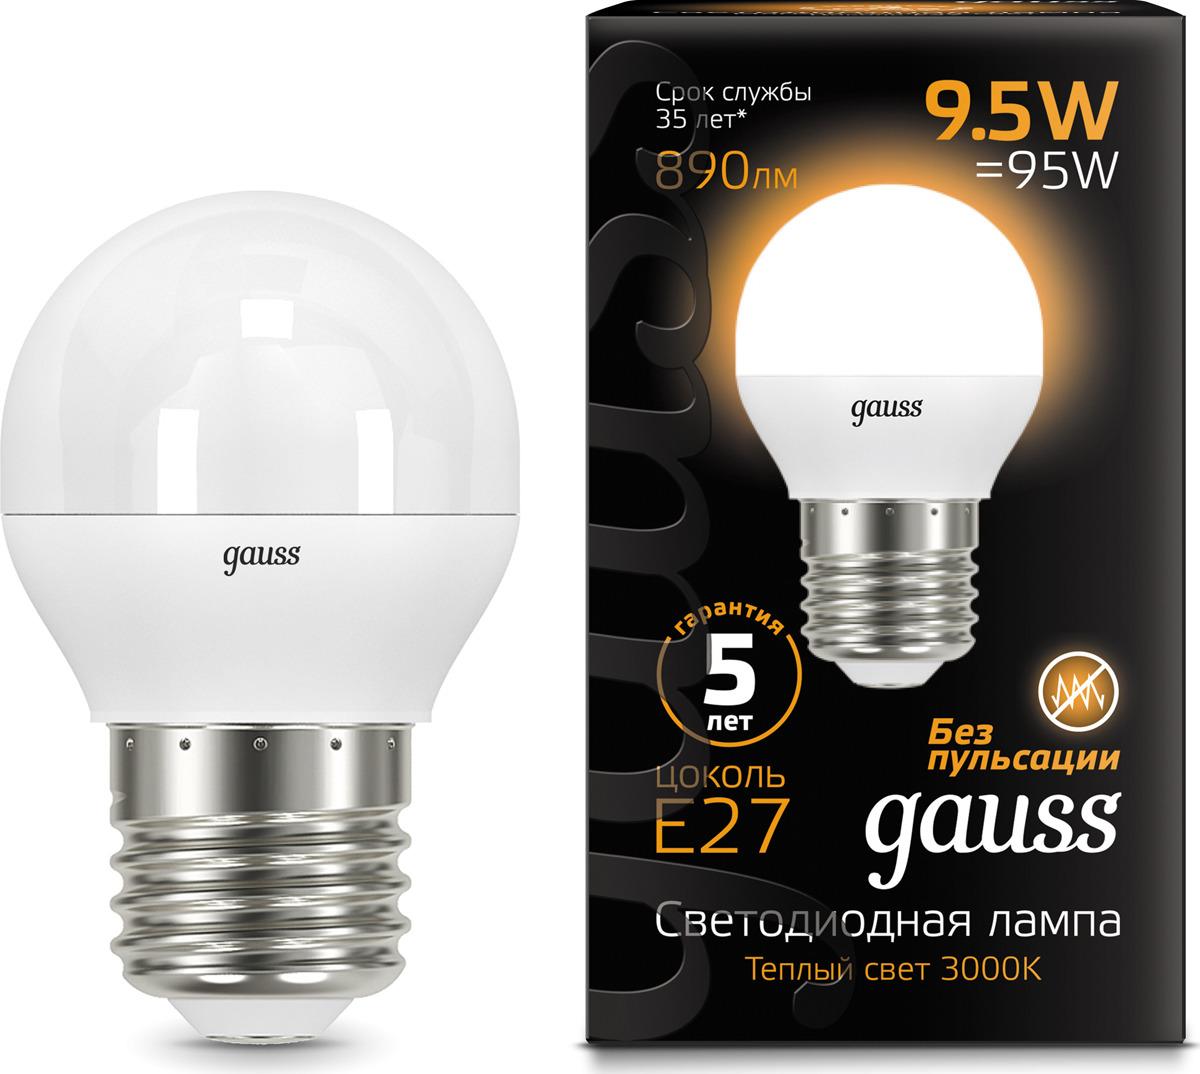 Лампочка Gauss Black LED, шар, E27, 9,5W. 105102110 лампочка gauss gs 105801205